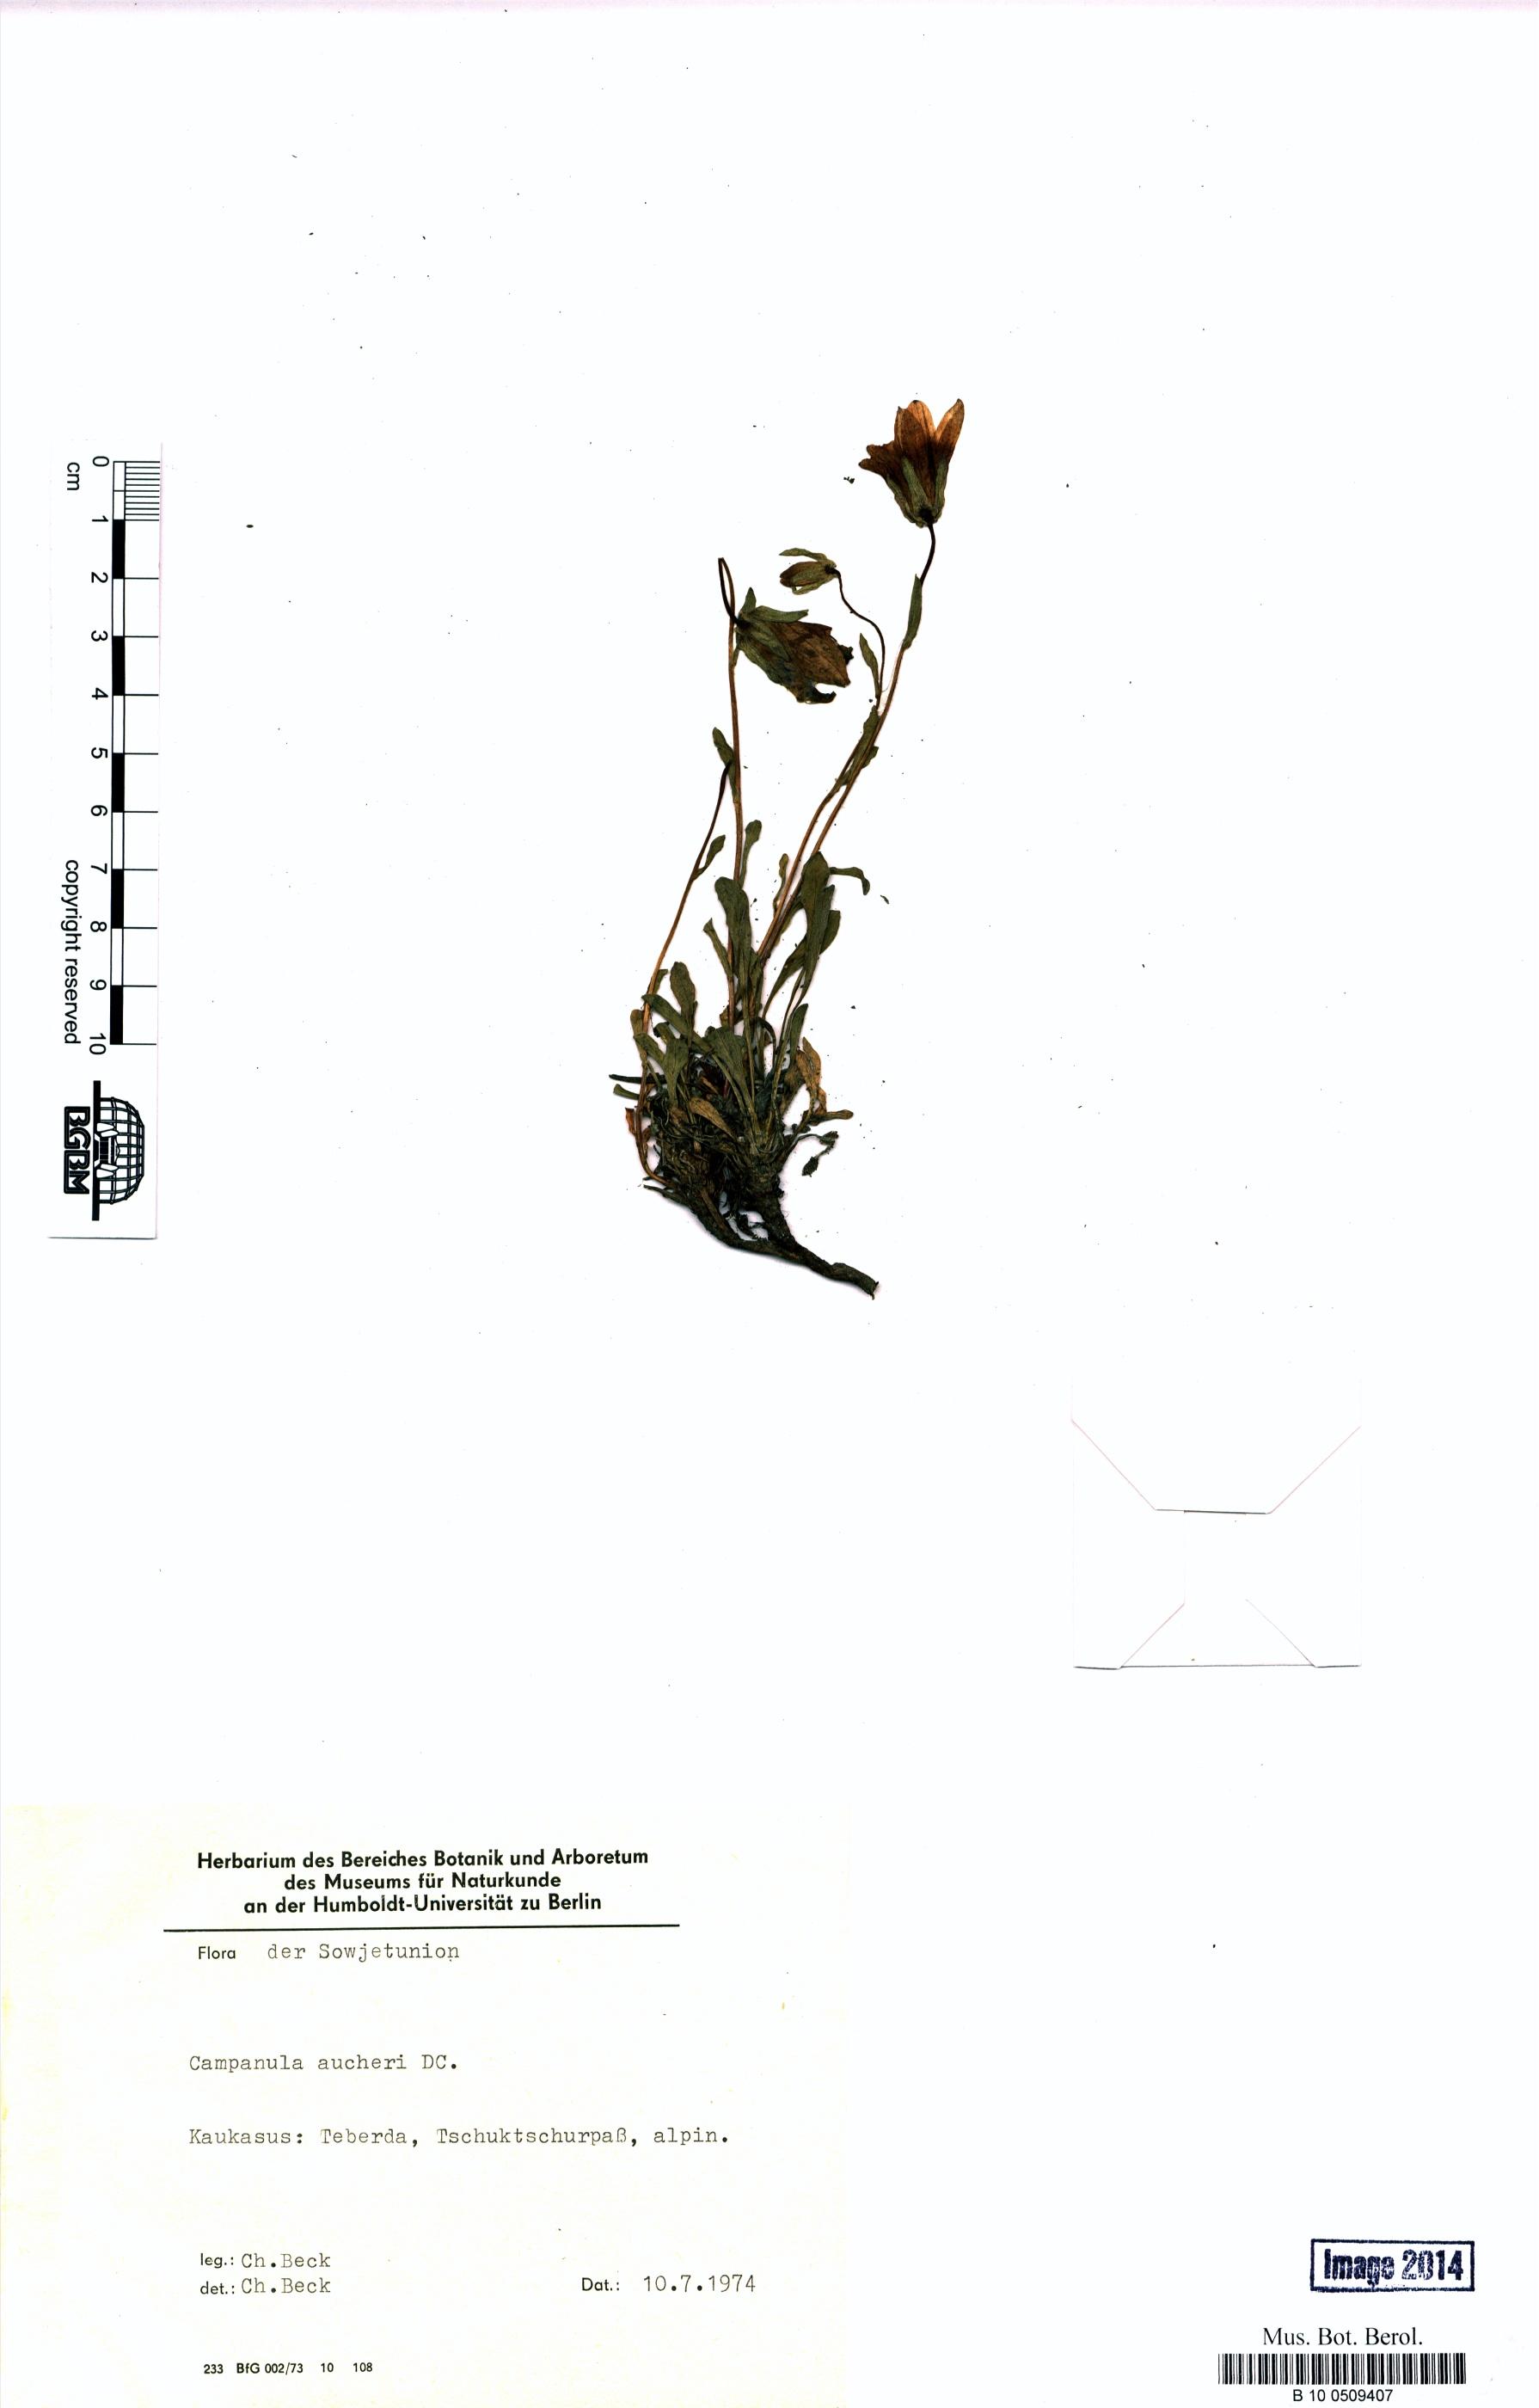 http://ww2.bgbm.org/herbarium/images/B/10/05/09/40/B_10_0509407.jpg